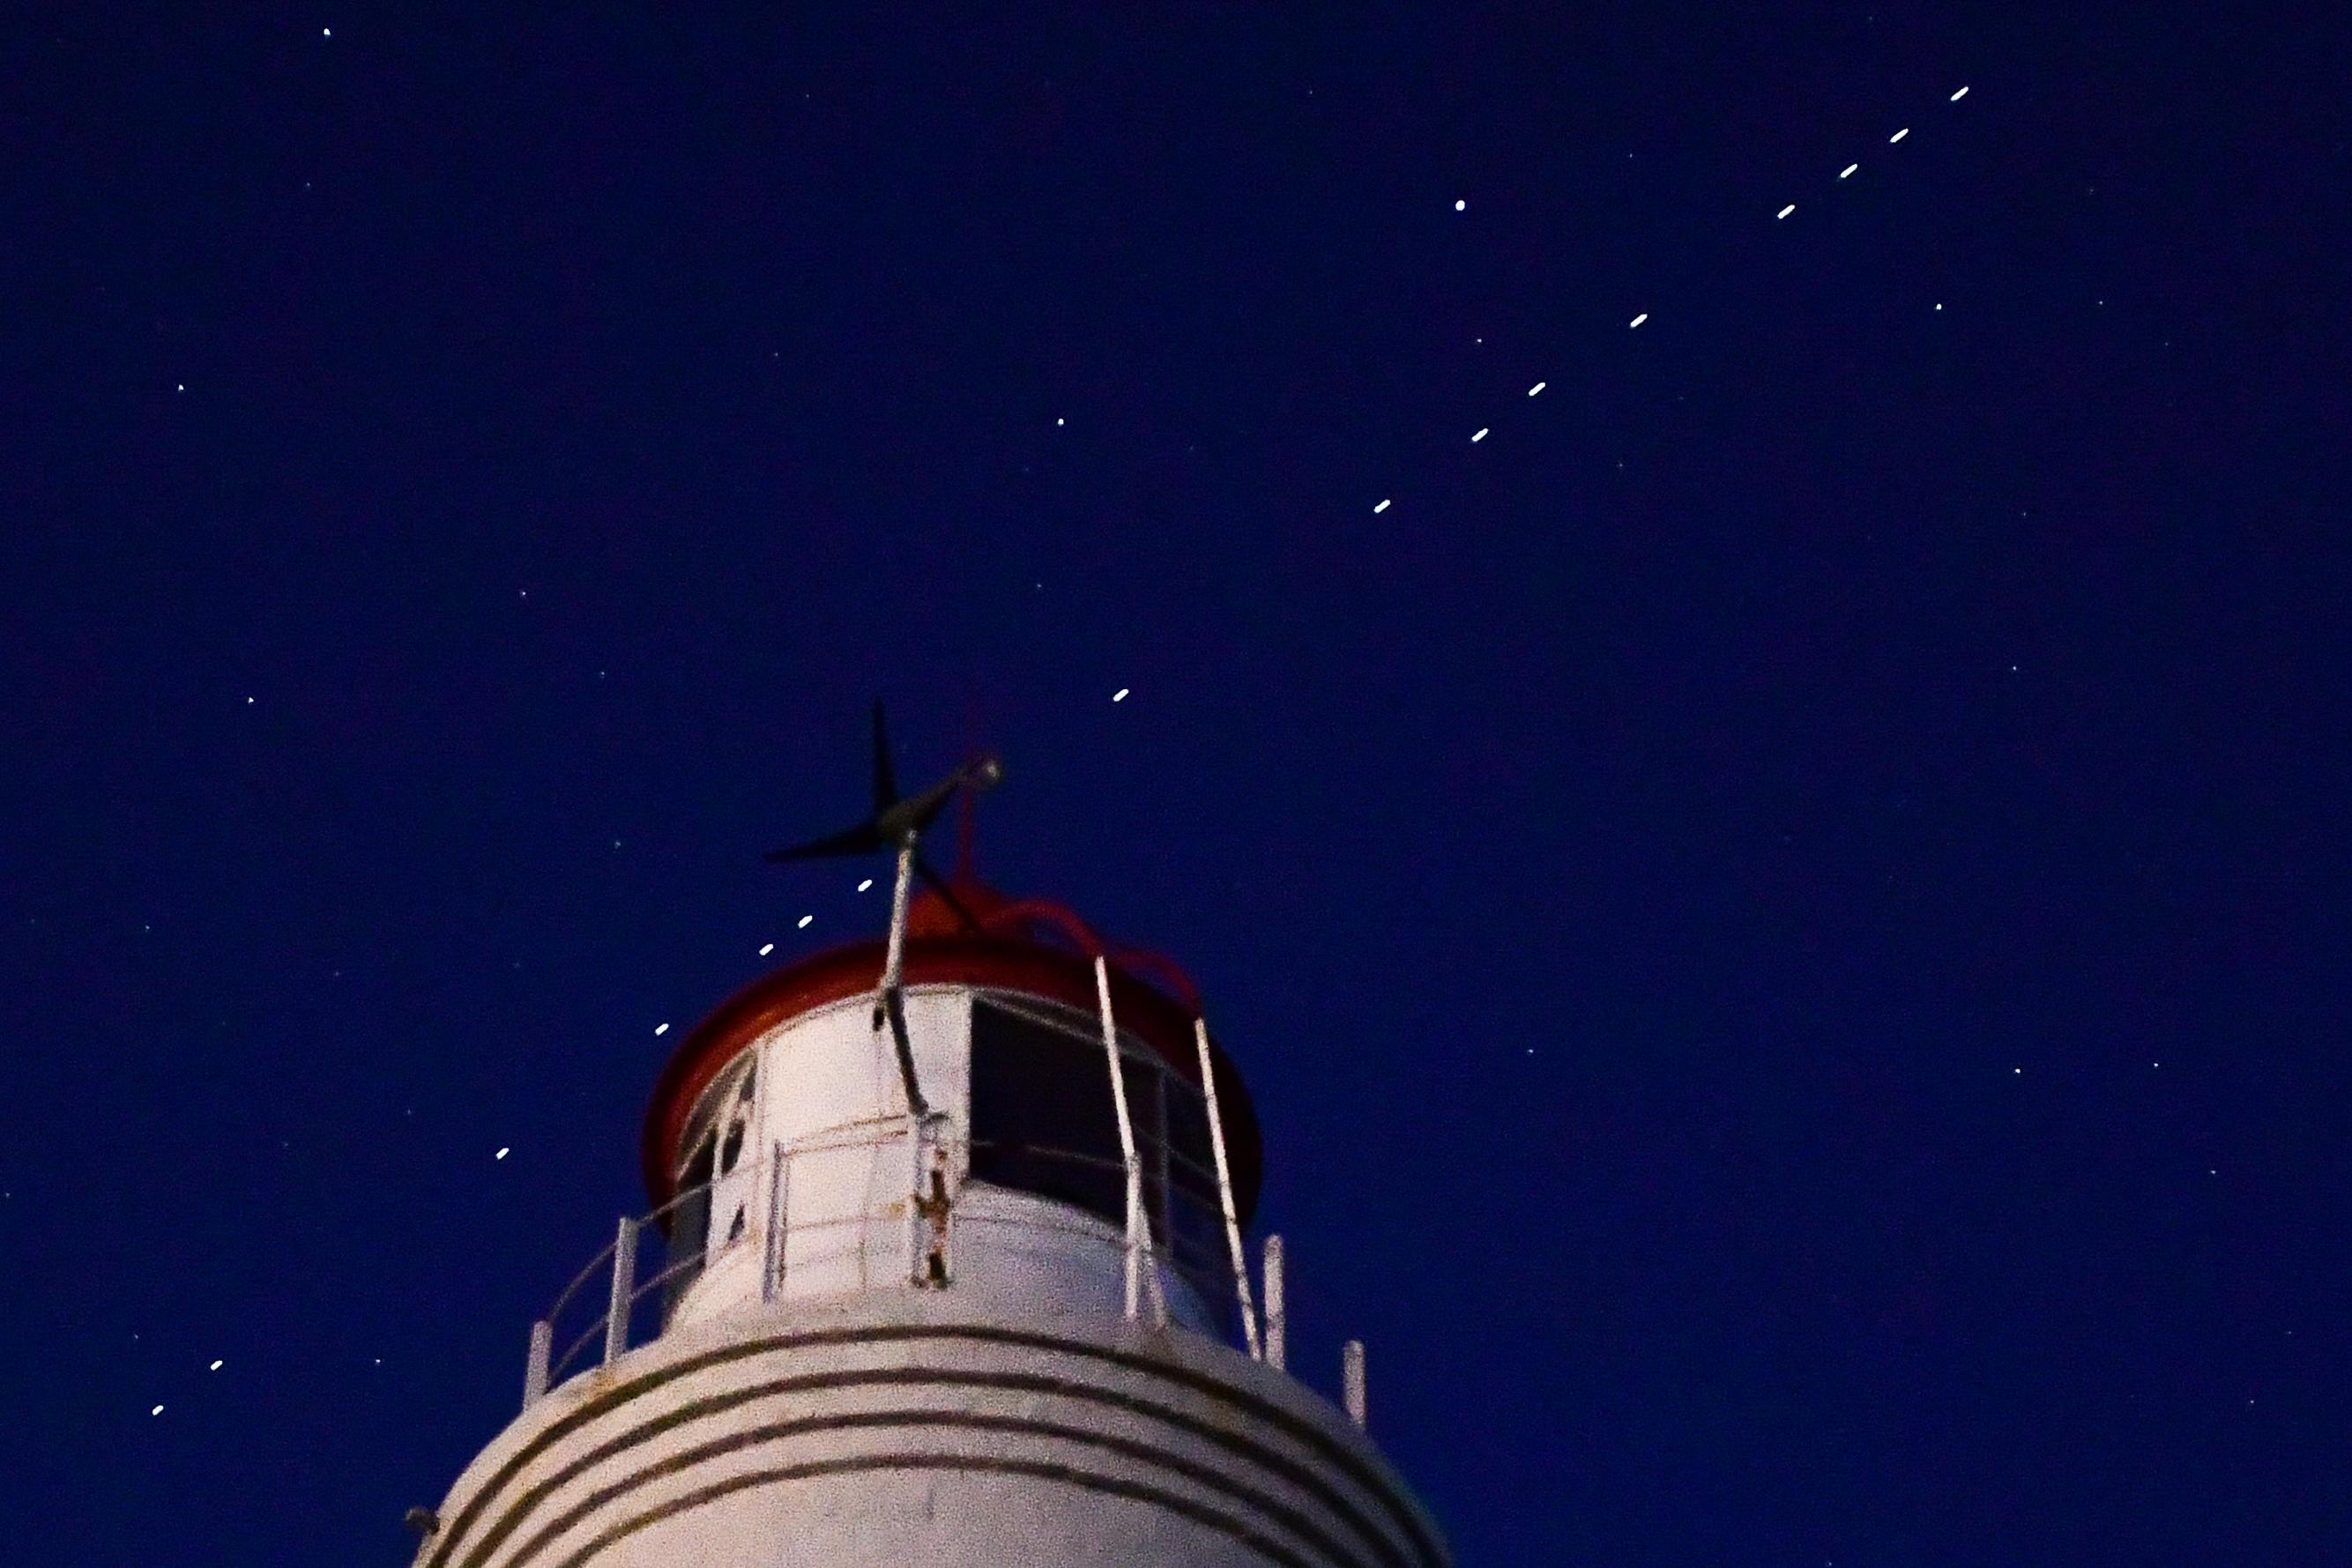 60 SpaceX's Starlink Internet satellites on Earth orbit